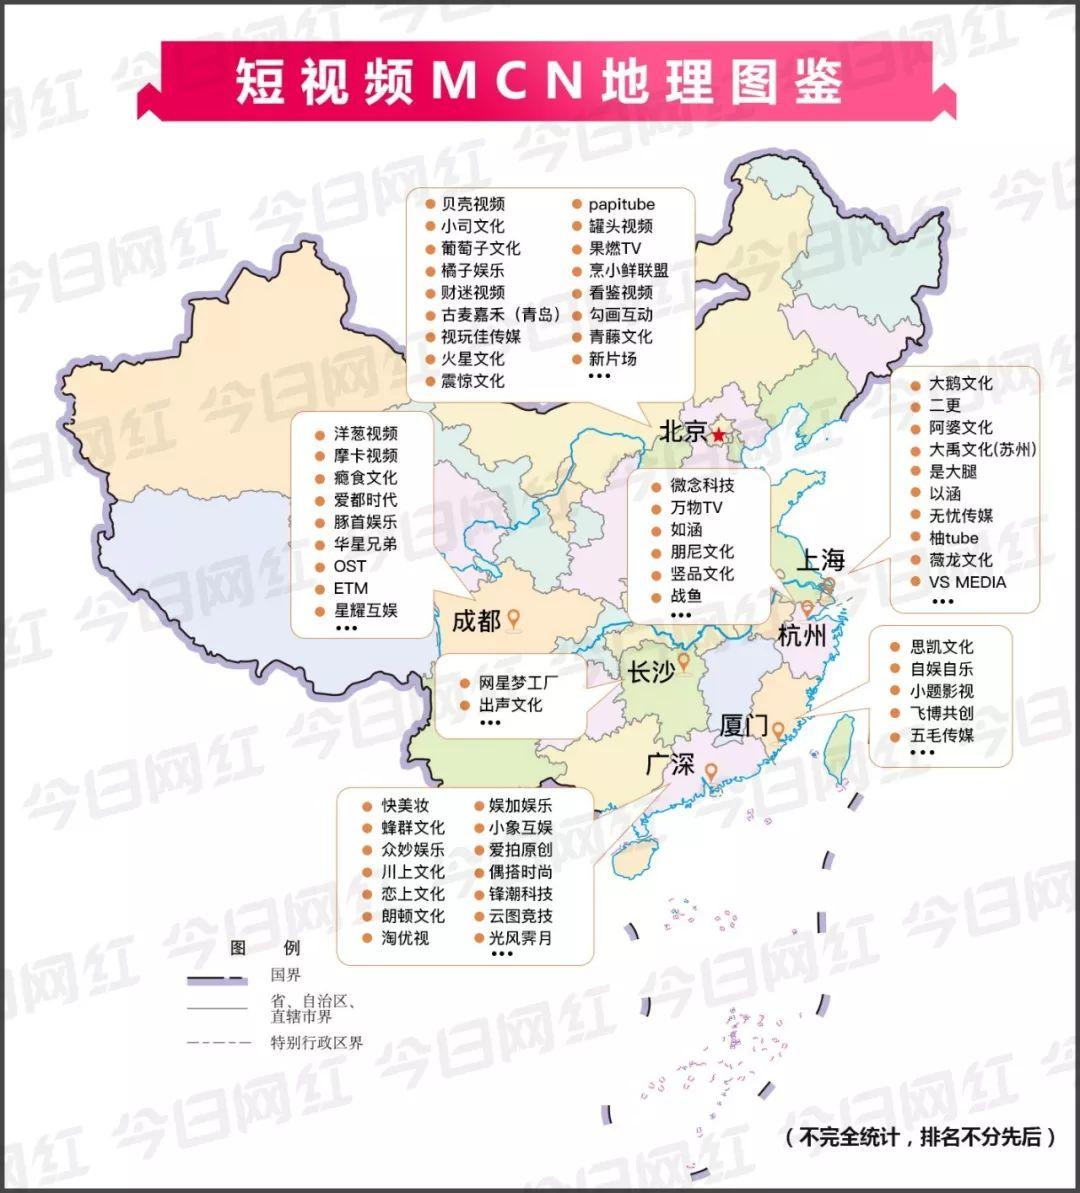 <a href='http://www.mcnjigou.com/'>MCN</a>图谱 | 8大城市,63家头部机构,当网红达人,你该去哪?